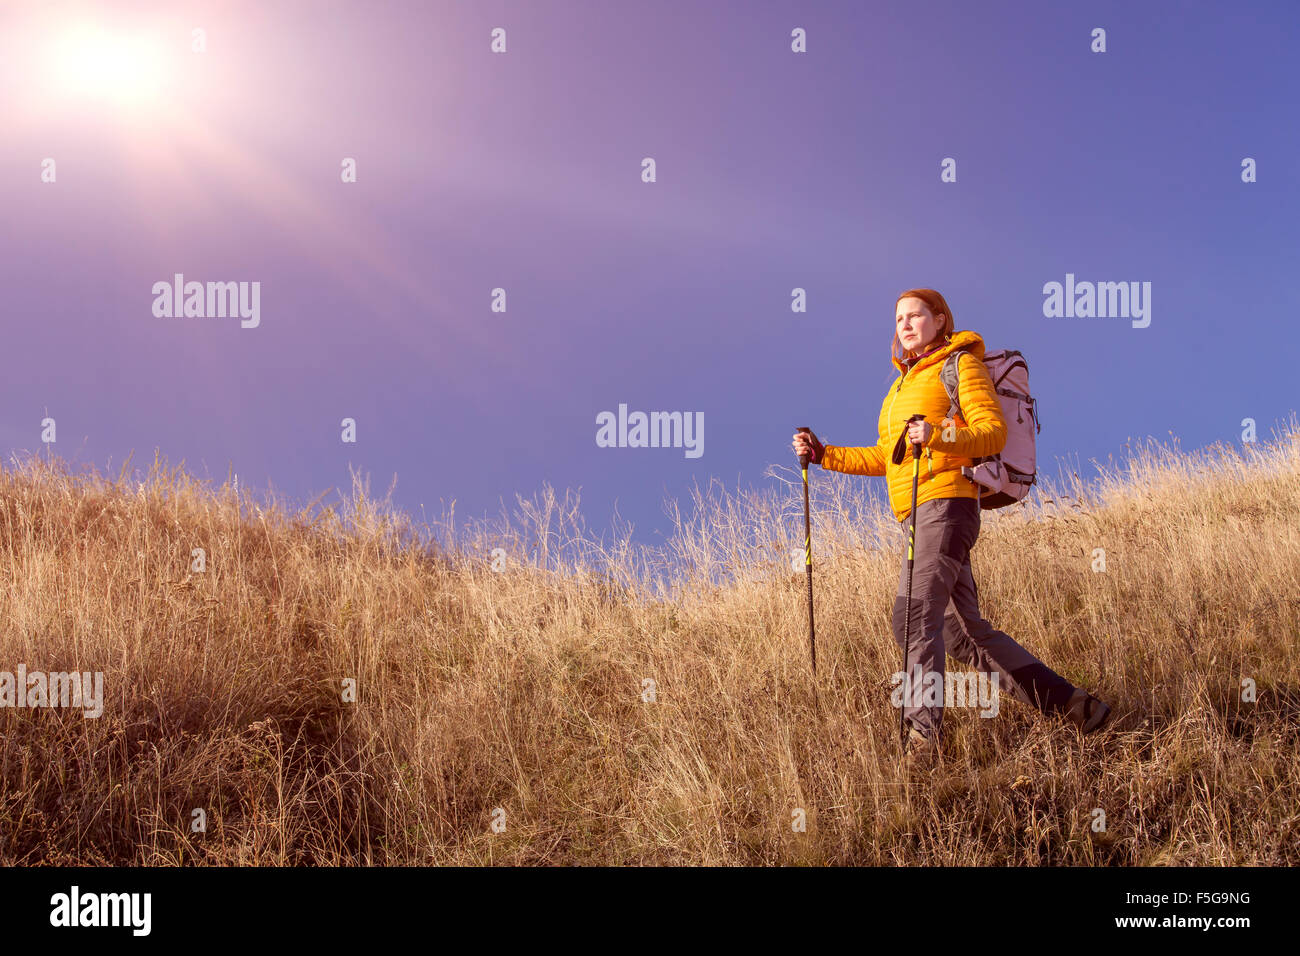 Excursionista hembra caminando en grassy hill Foto de stock